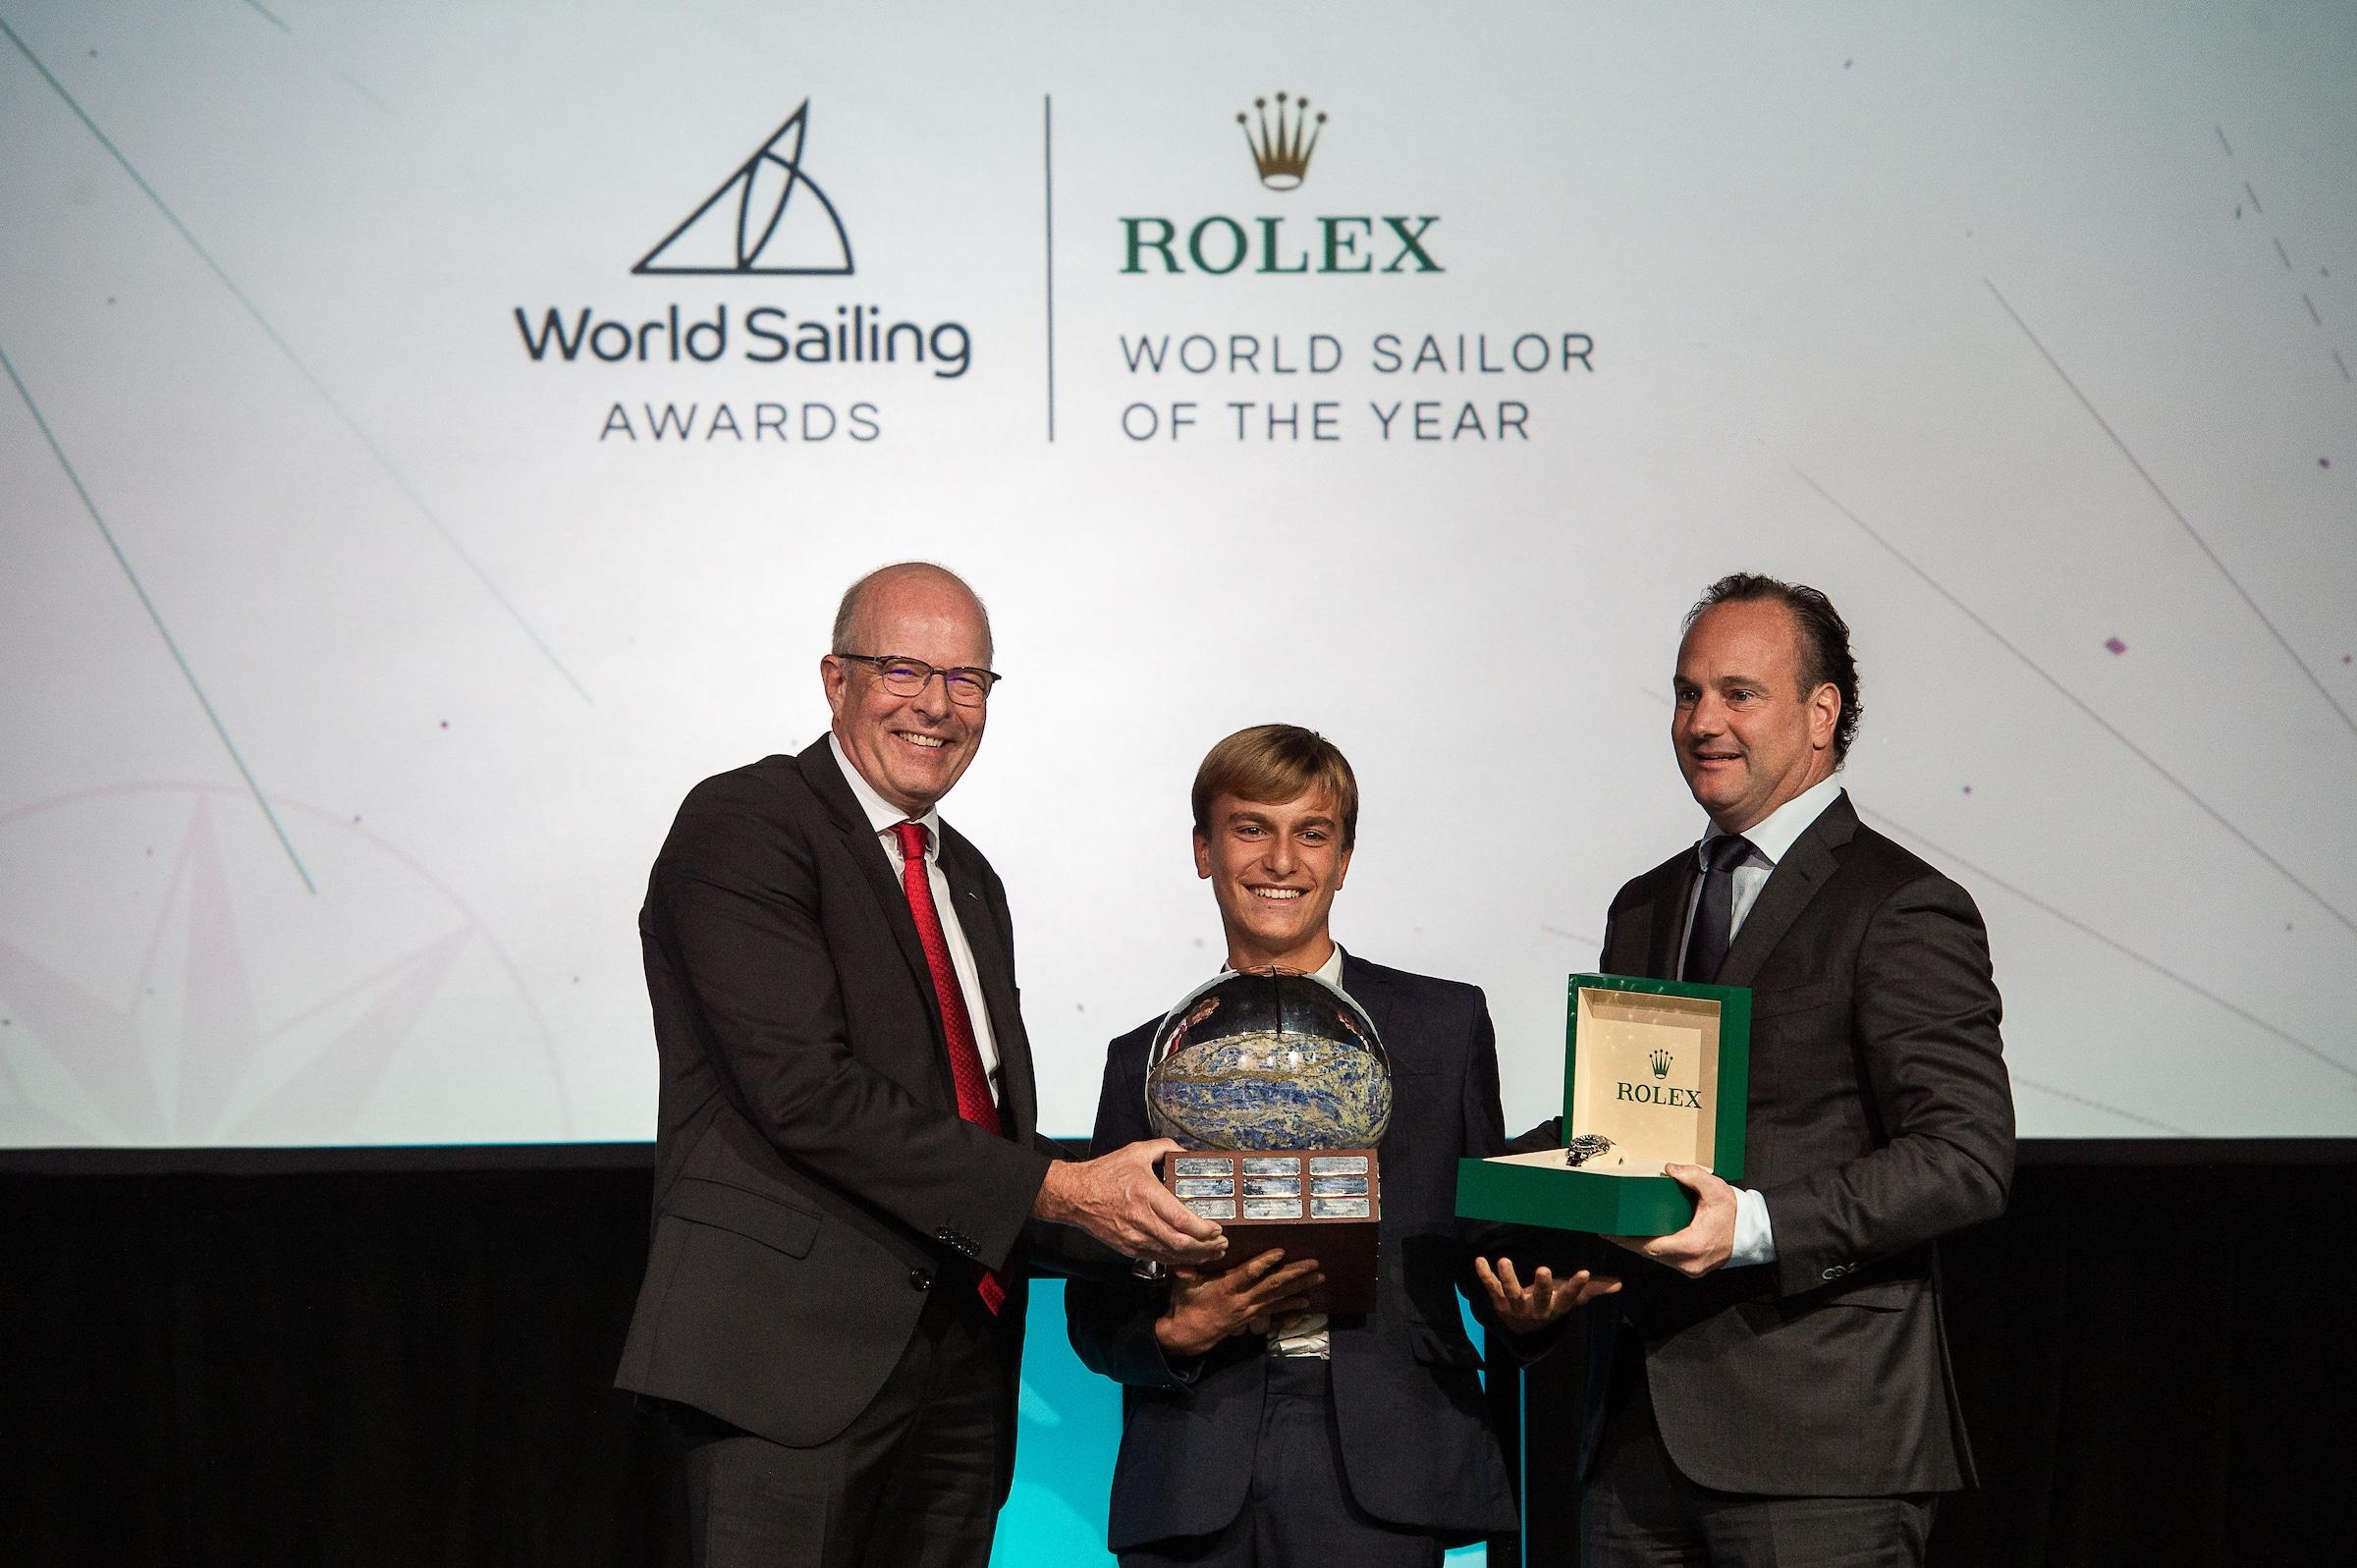 Marco Gradoni ROLEX WORLD SAILOR OF THE YEAR 2019